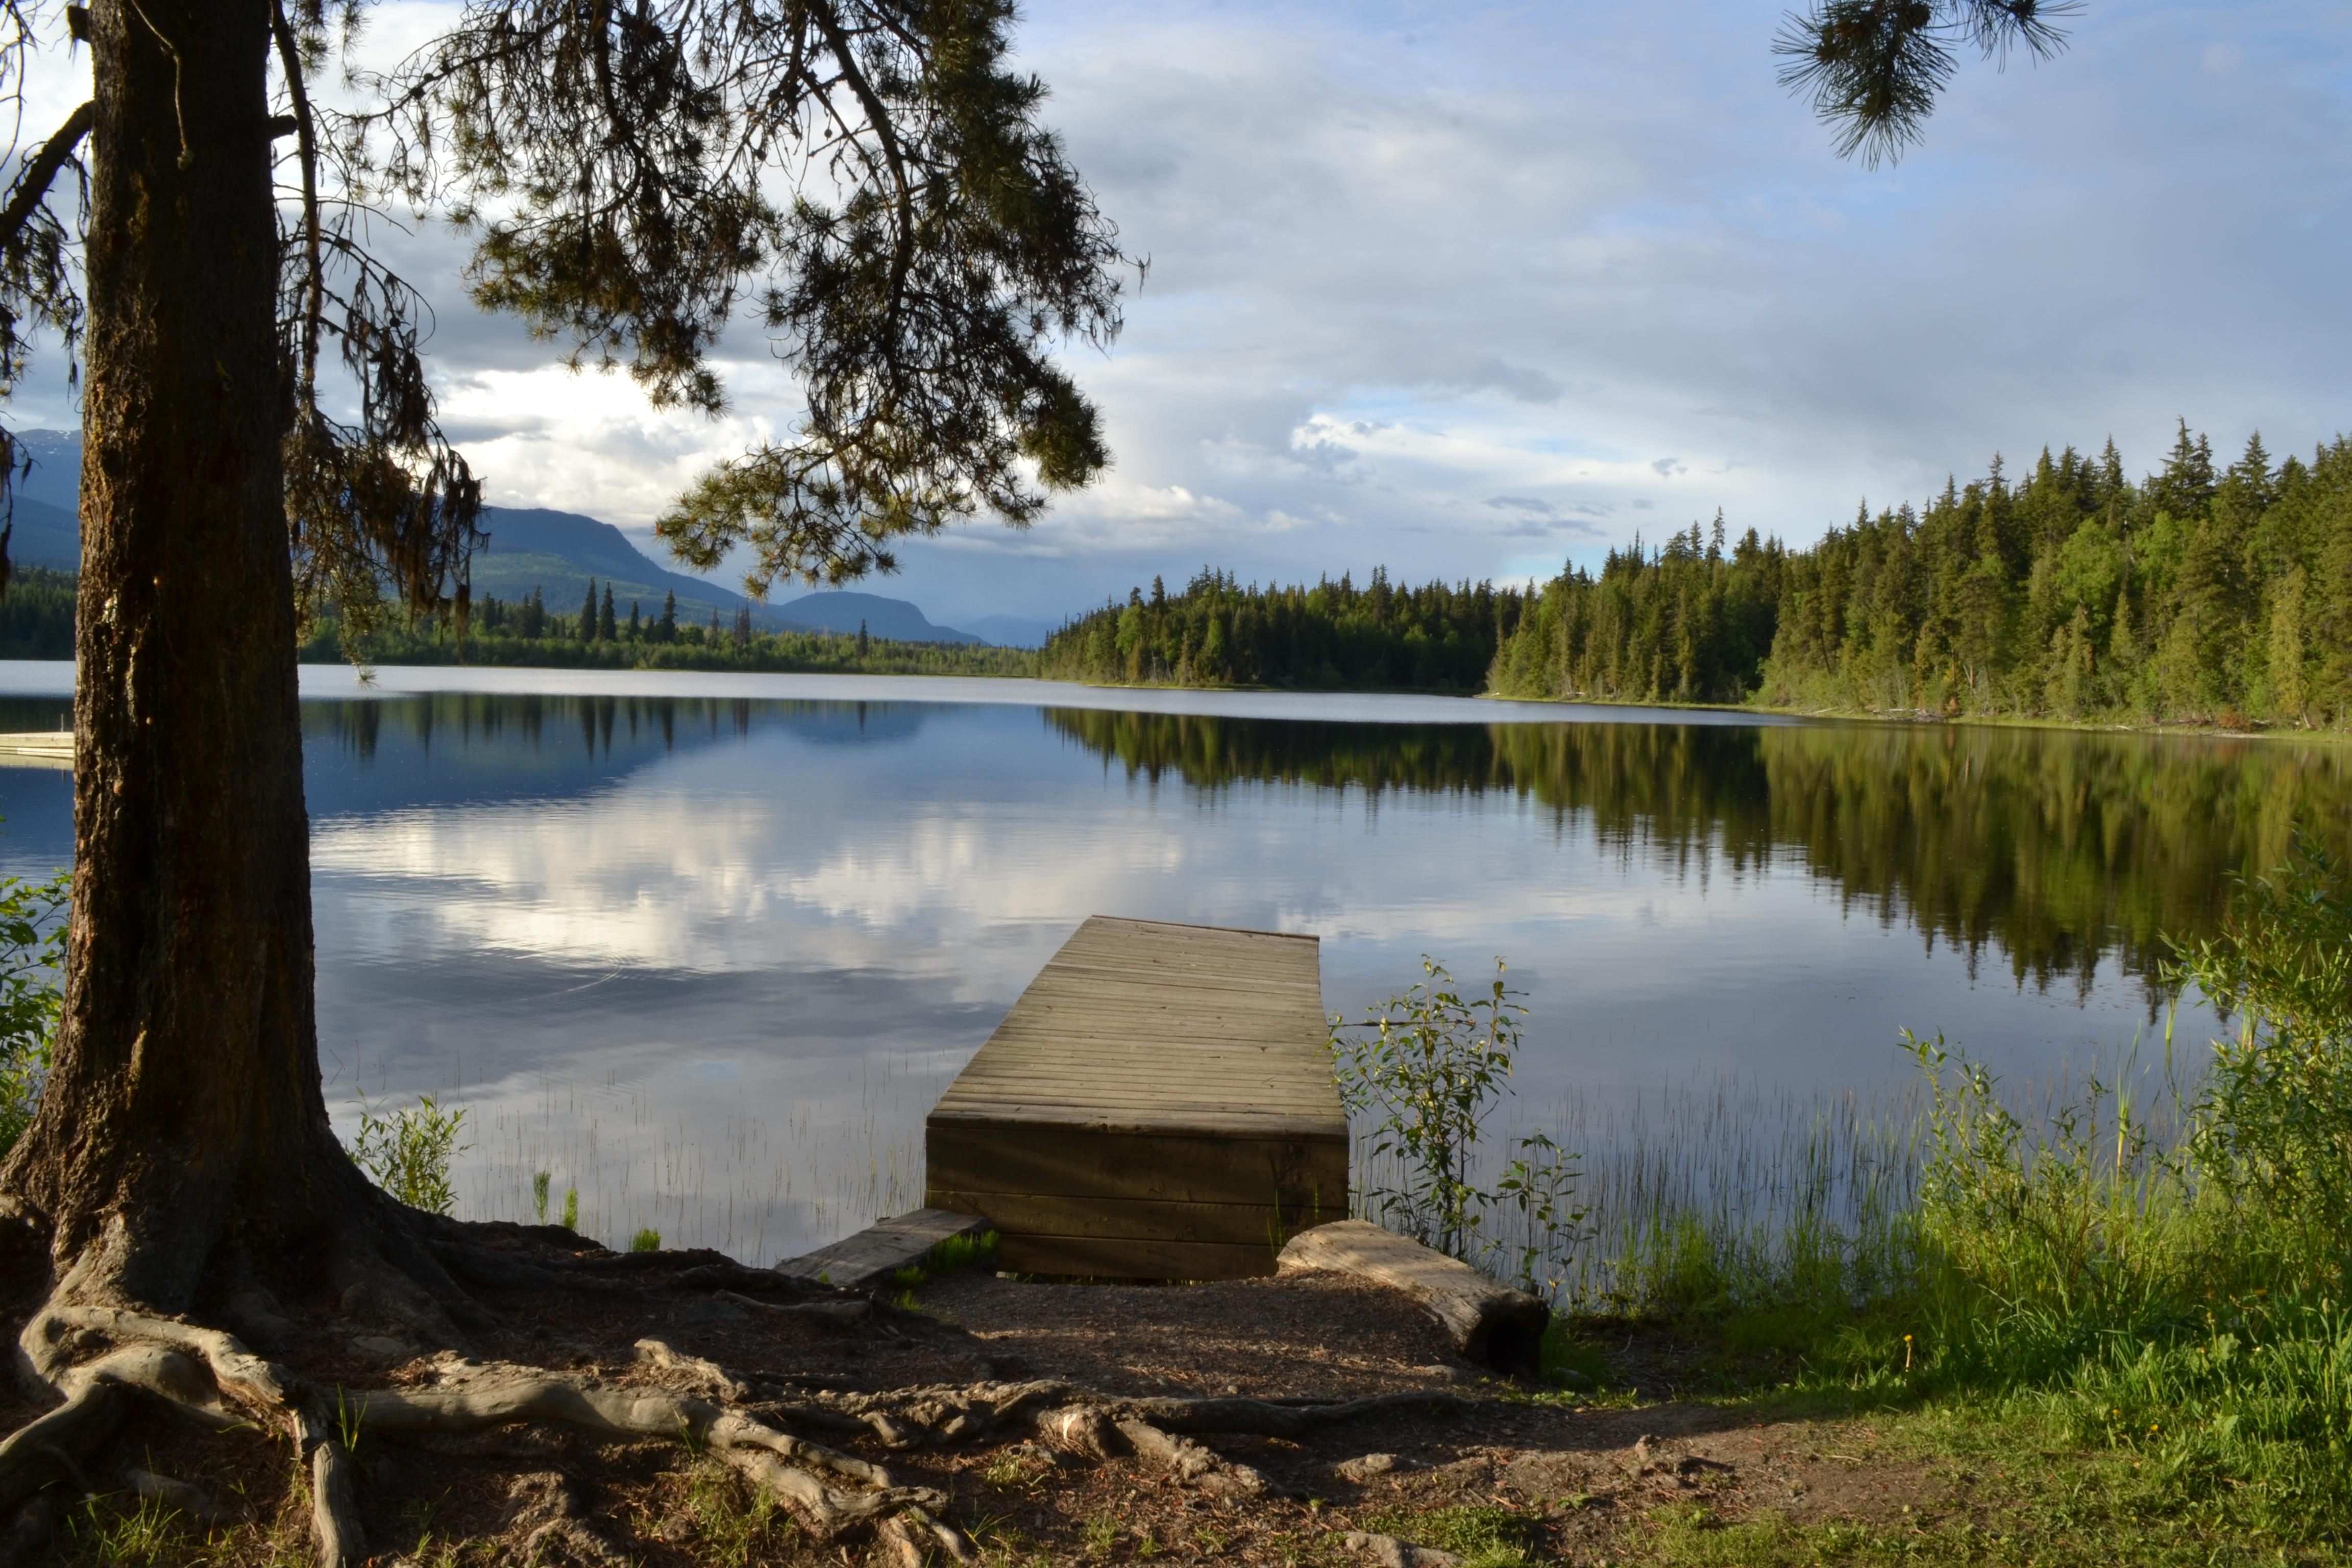 Keynton Lake